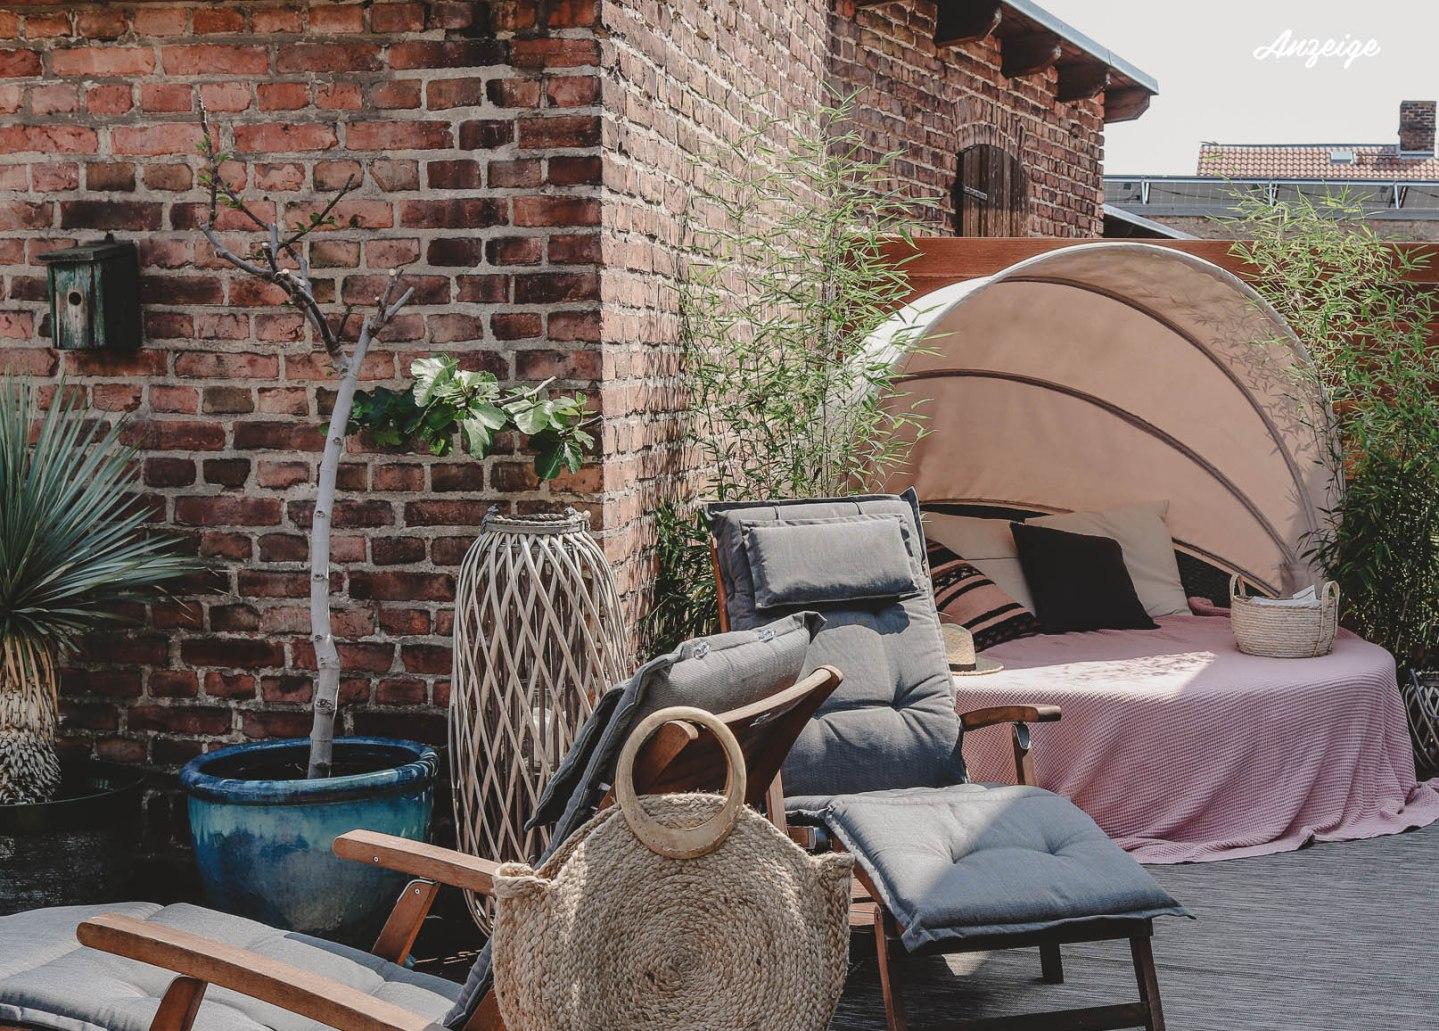 Alexa-Peng-eBay-zuhause-im-Urlaub-Aufmacher